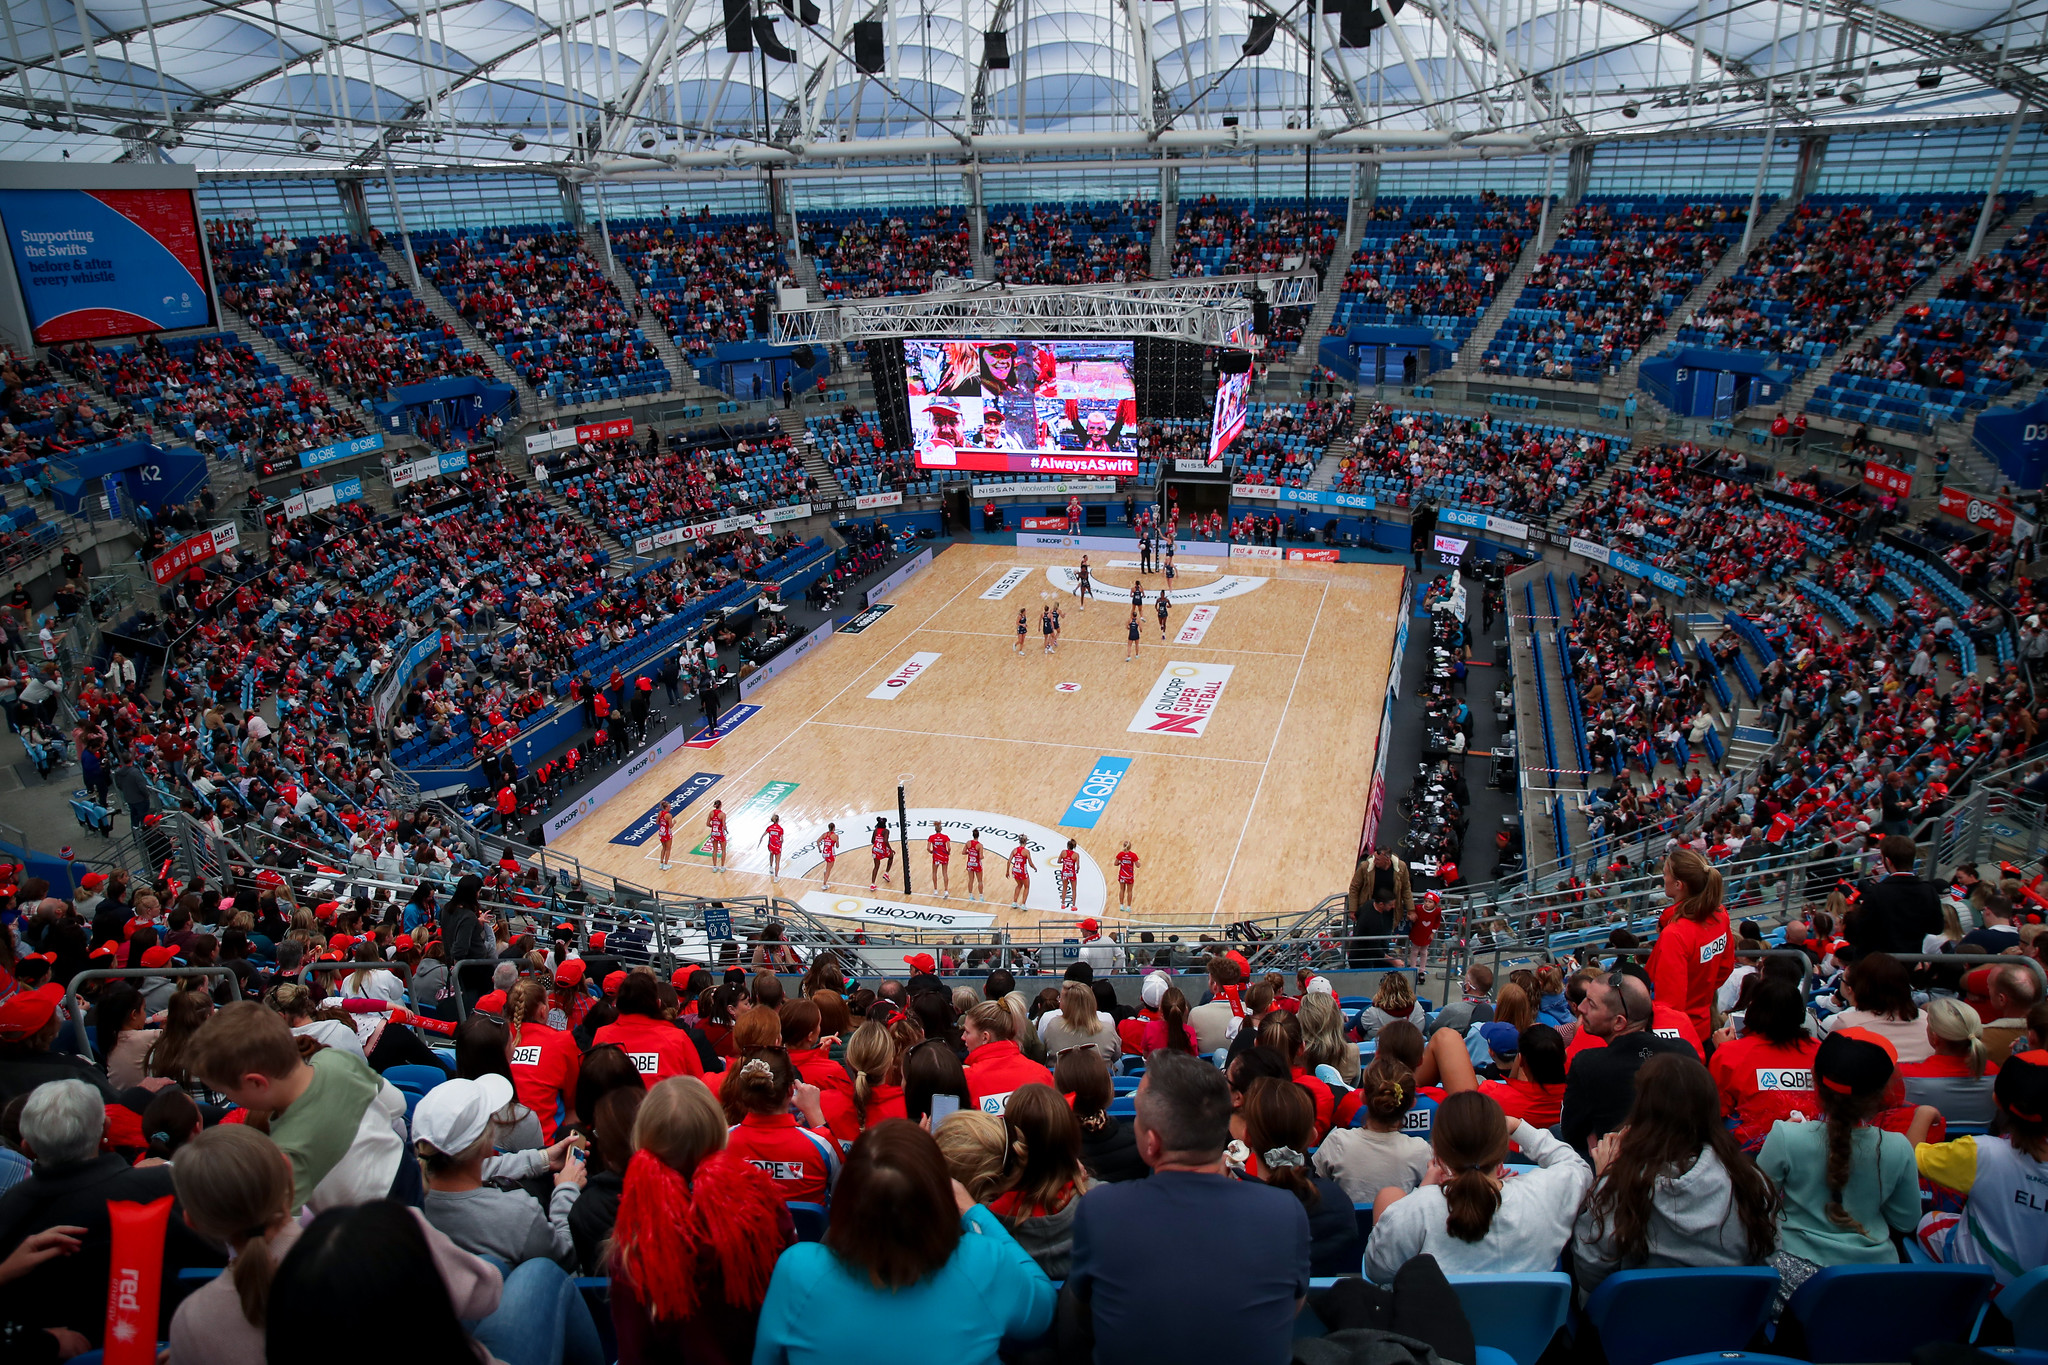 Ken Rosewell Arena